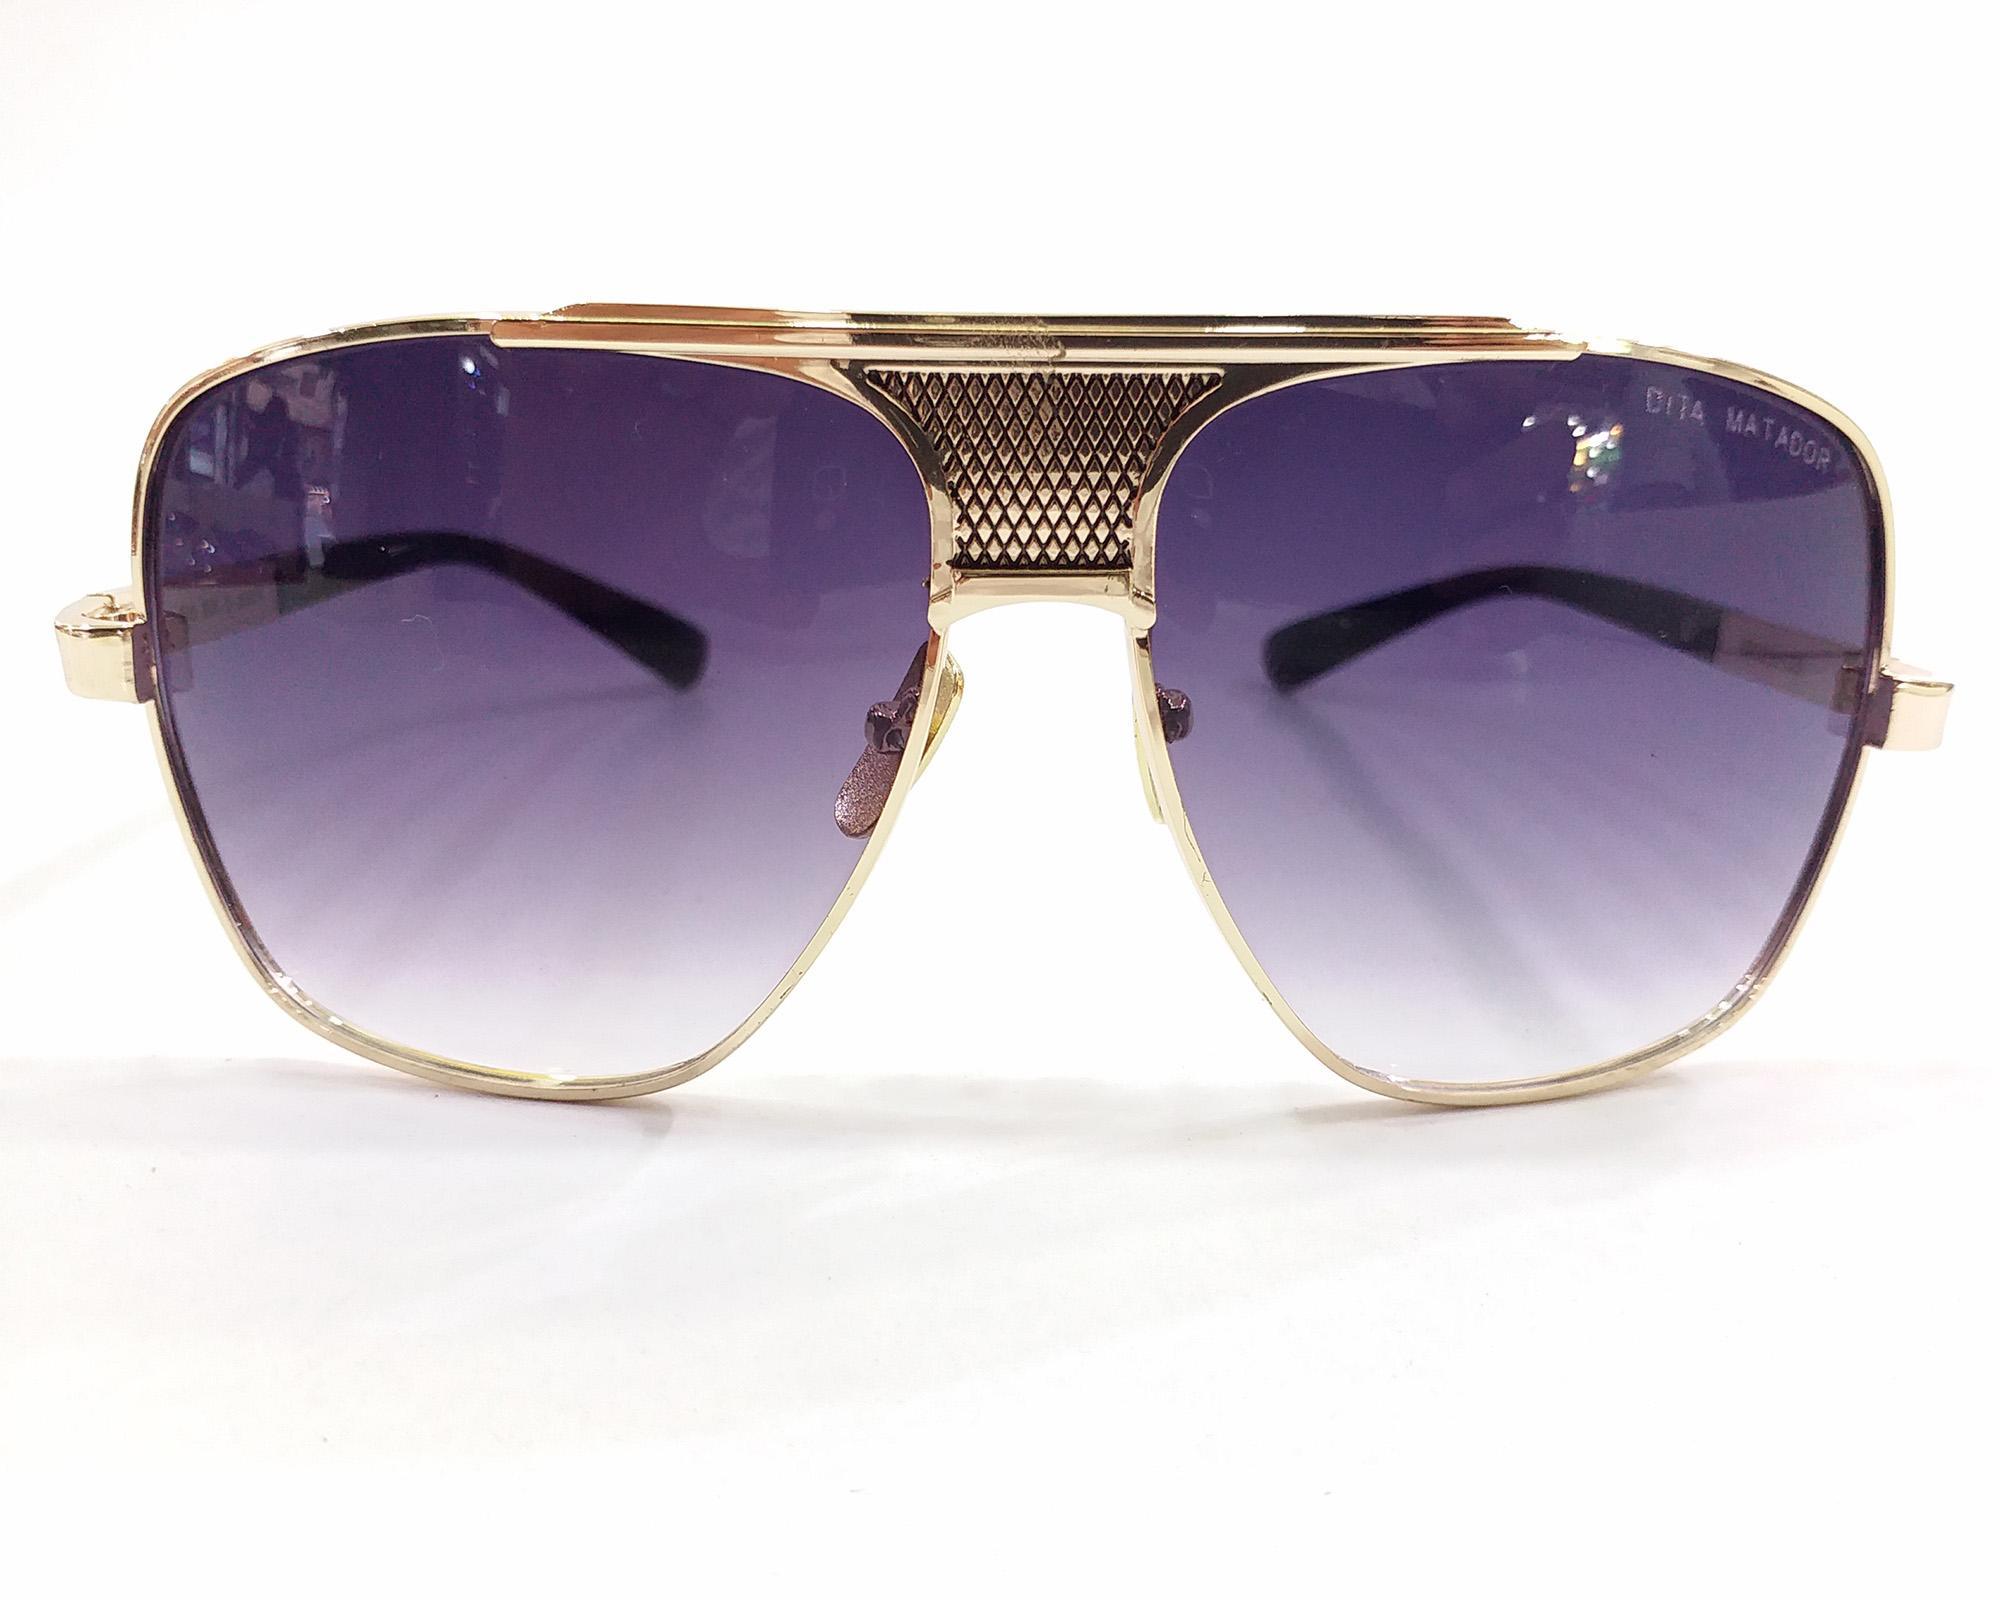 ee1e960e616f Buy Dita Eyewear Glasses at Best Prices Online in Pakistan - daraz.pk